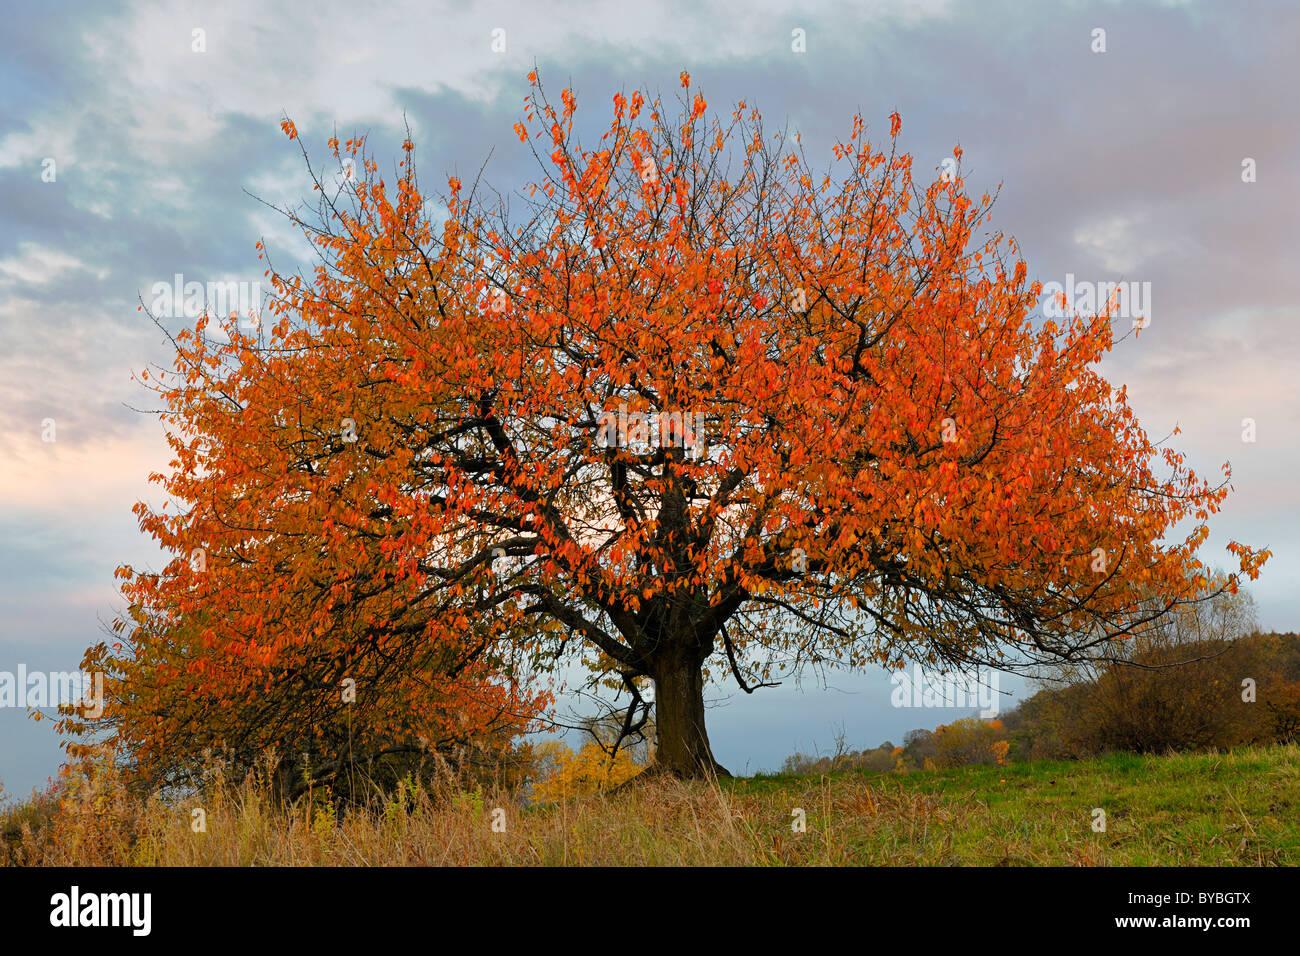 Autumnal cherry tree in the fading light, Biosphaerengebiet Swabian Alb biosphere region, Baden-Wuerttemberg, Germany, - Stock Image